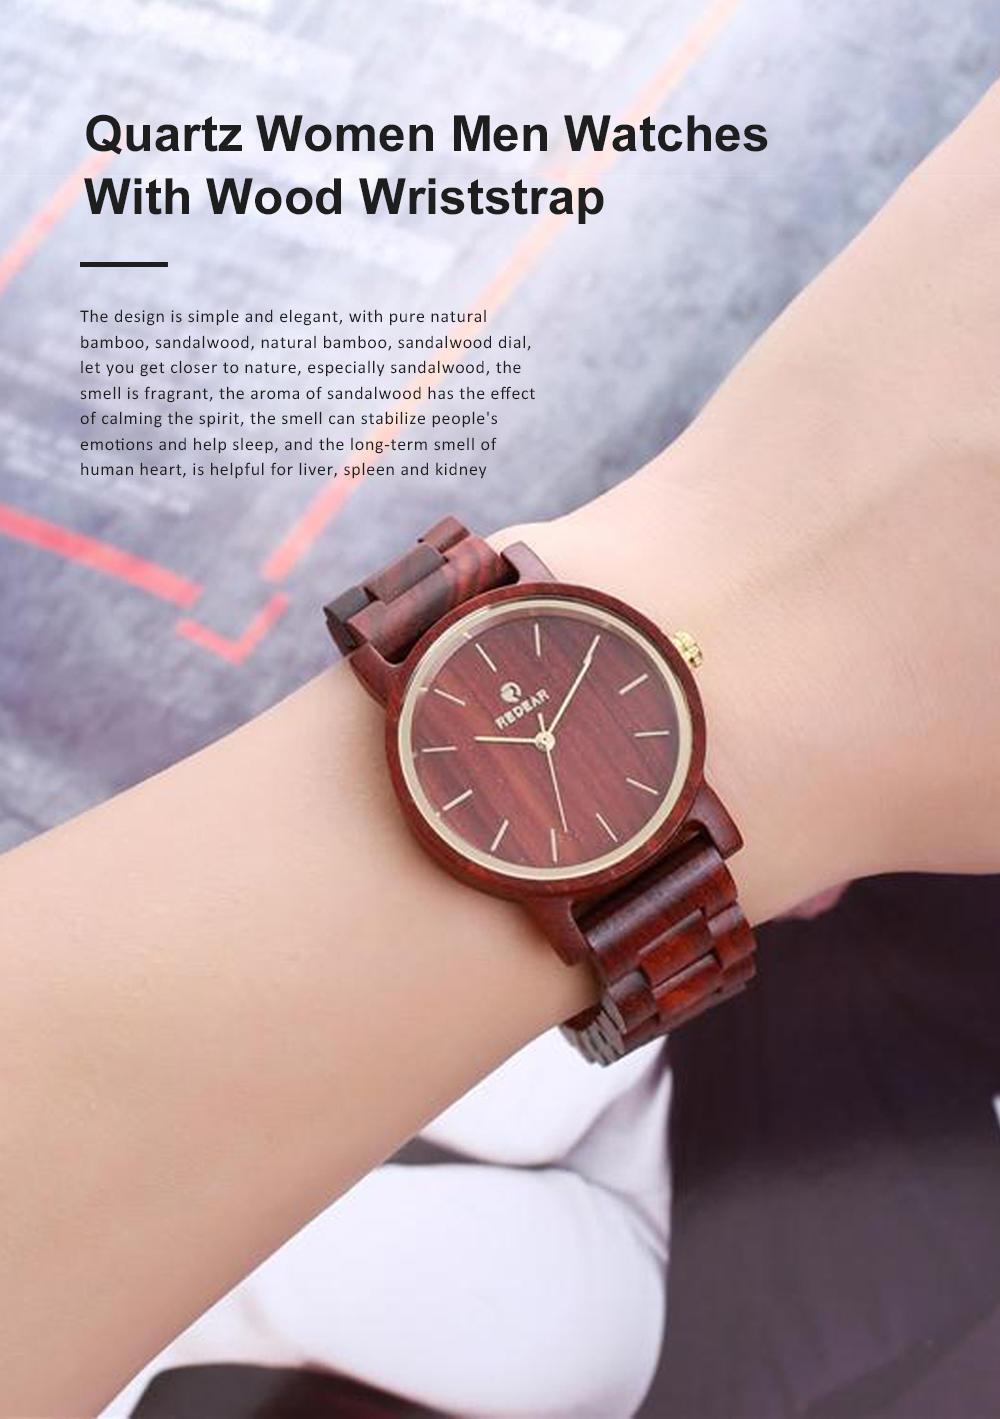 Men Women Watches Elegant Sandal Wood Band Combined Stainless Steel Quartz Wrist Bamboo Watch With Waterproof Wristwatch For Ladies Girls Men 0